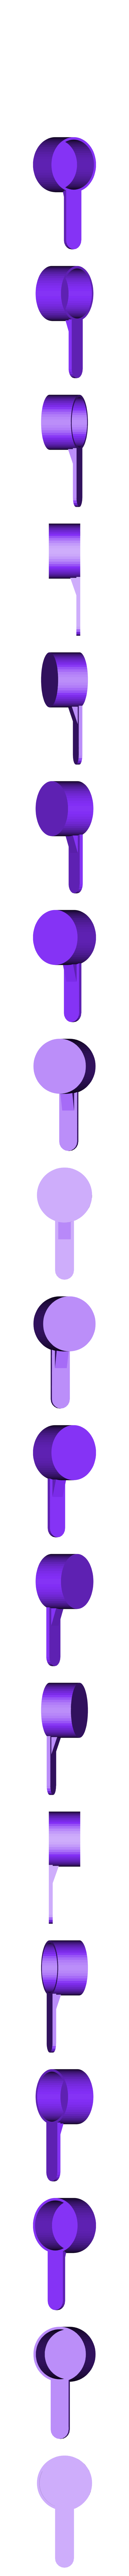 Measured teaspoon.stl Download STL file Fill your coffee Dolce Gusto capsules • 3D printer template, jankitokarczew